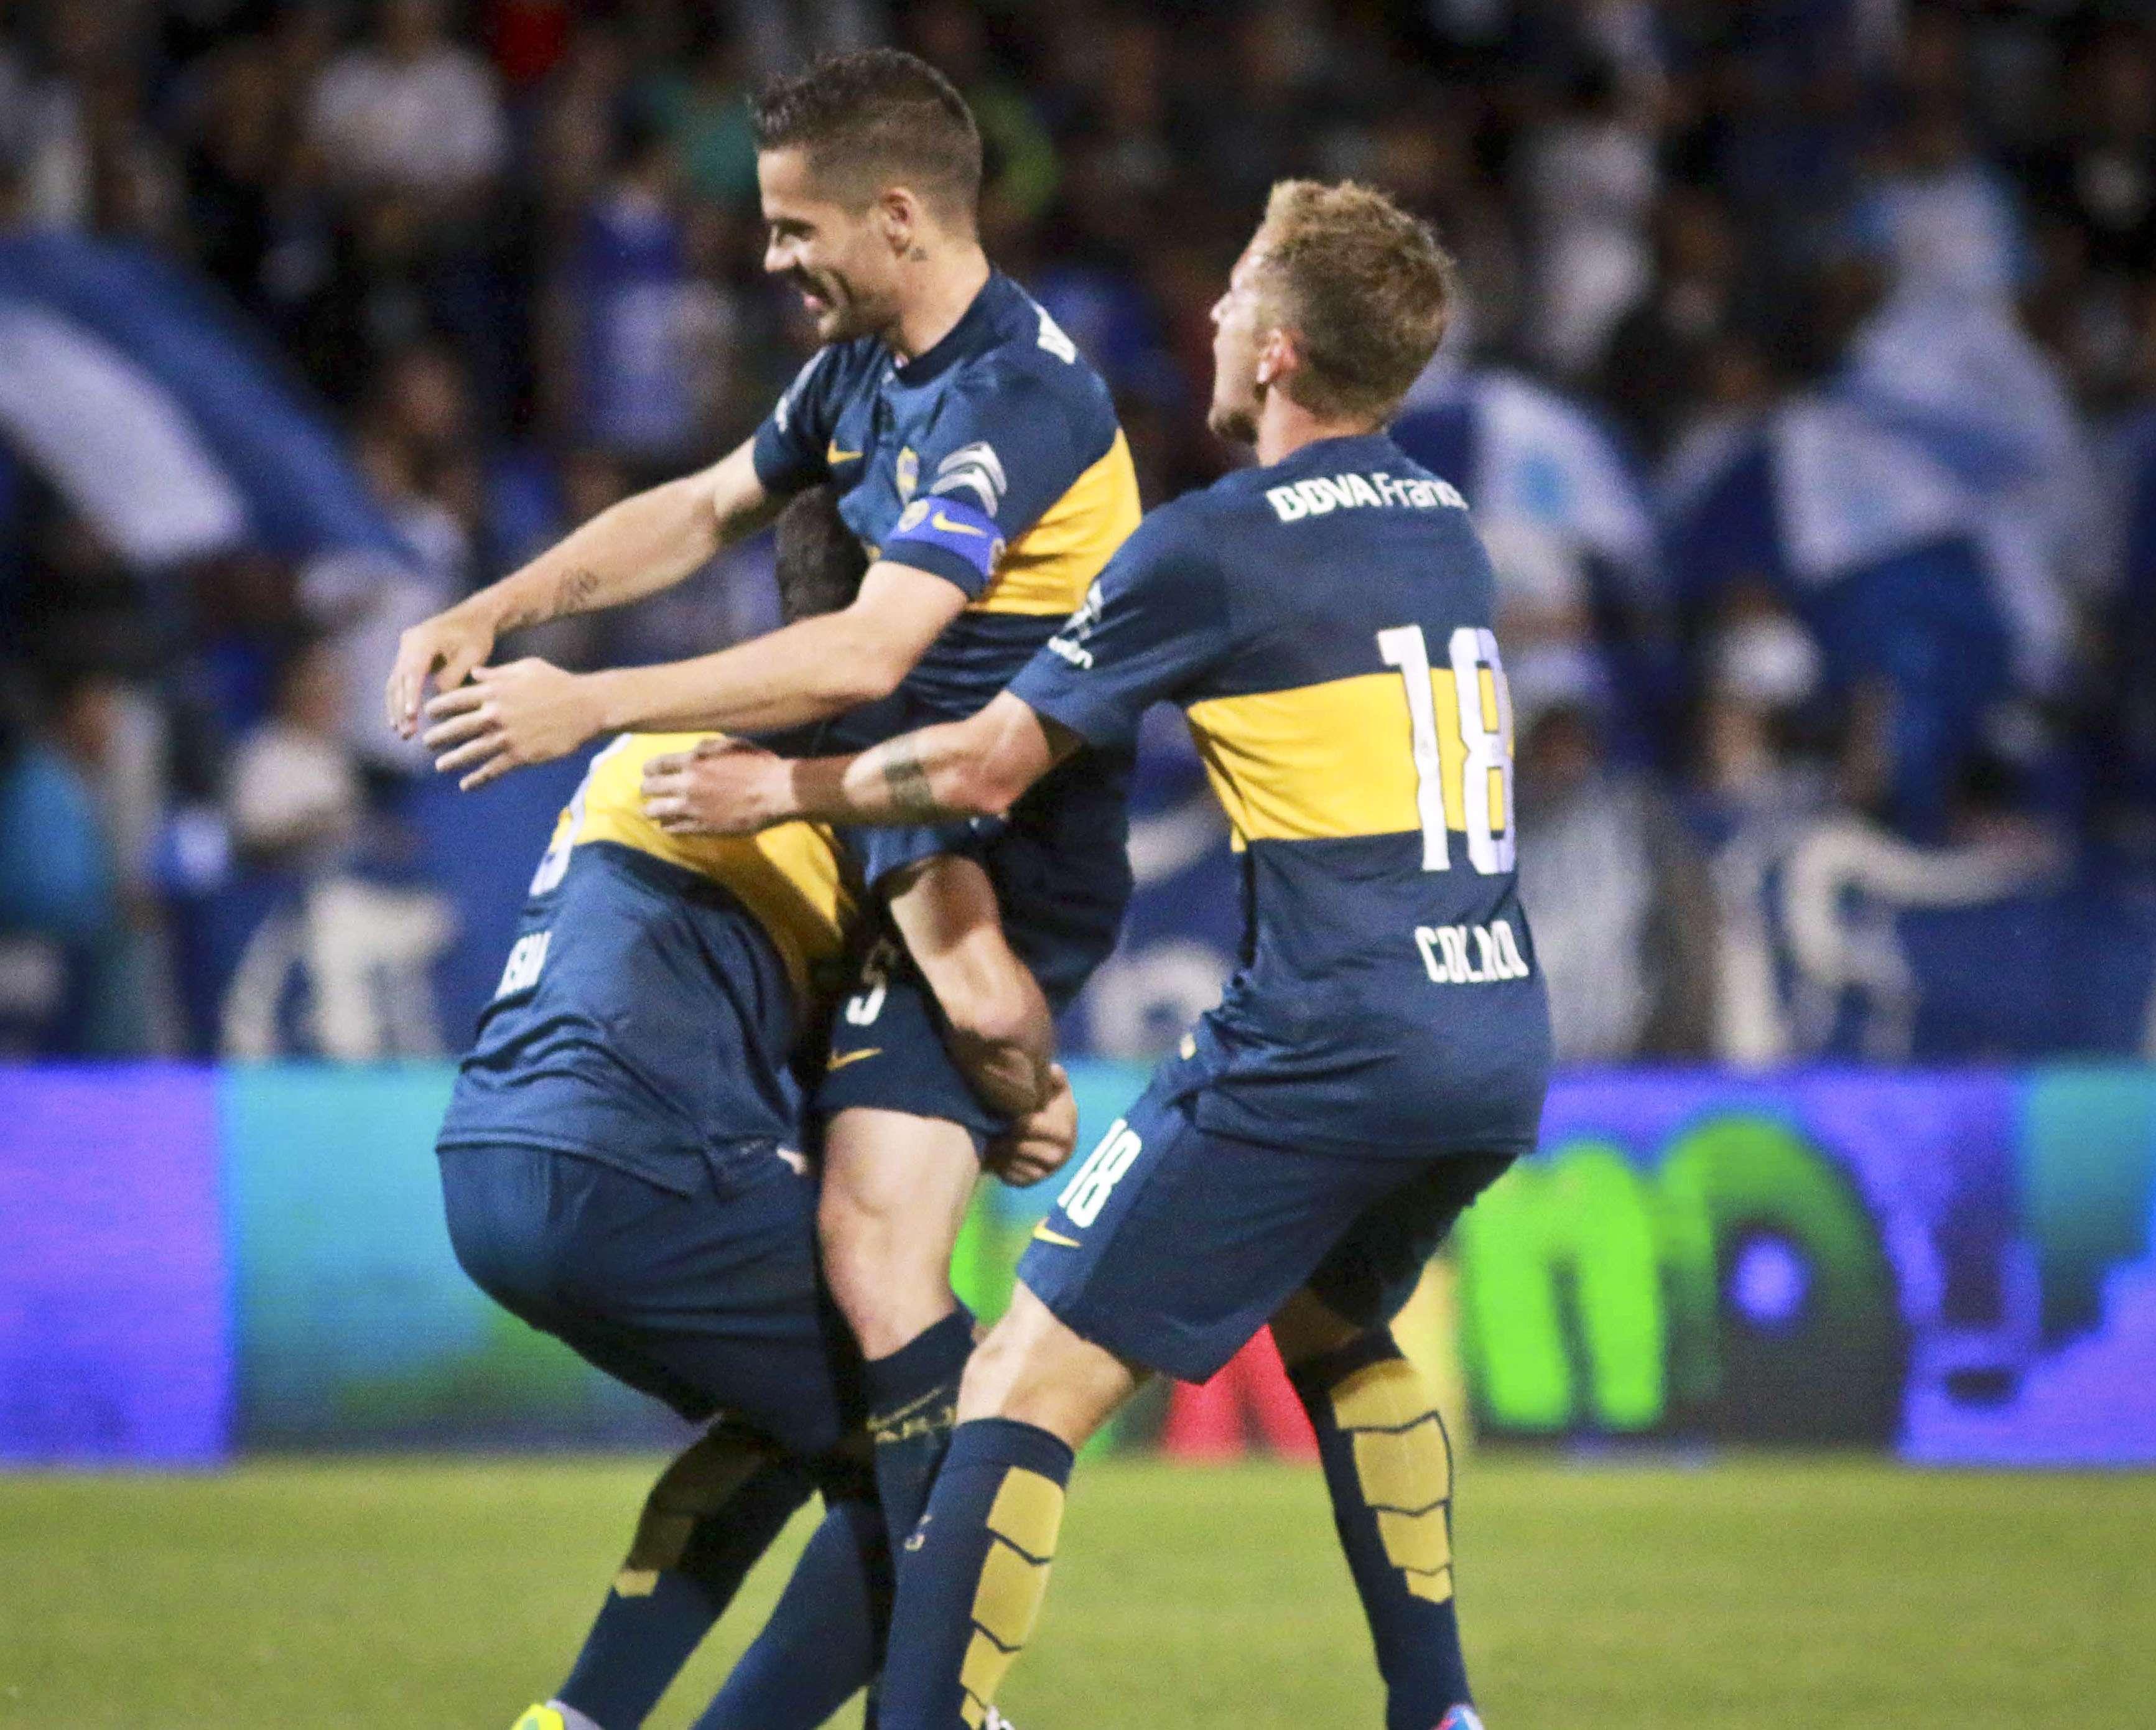 Boca derrotó este domingo a Godoy Cruz por 3 a 2 Foto: Agencias